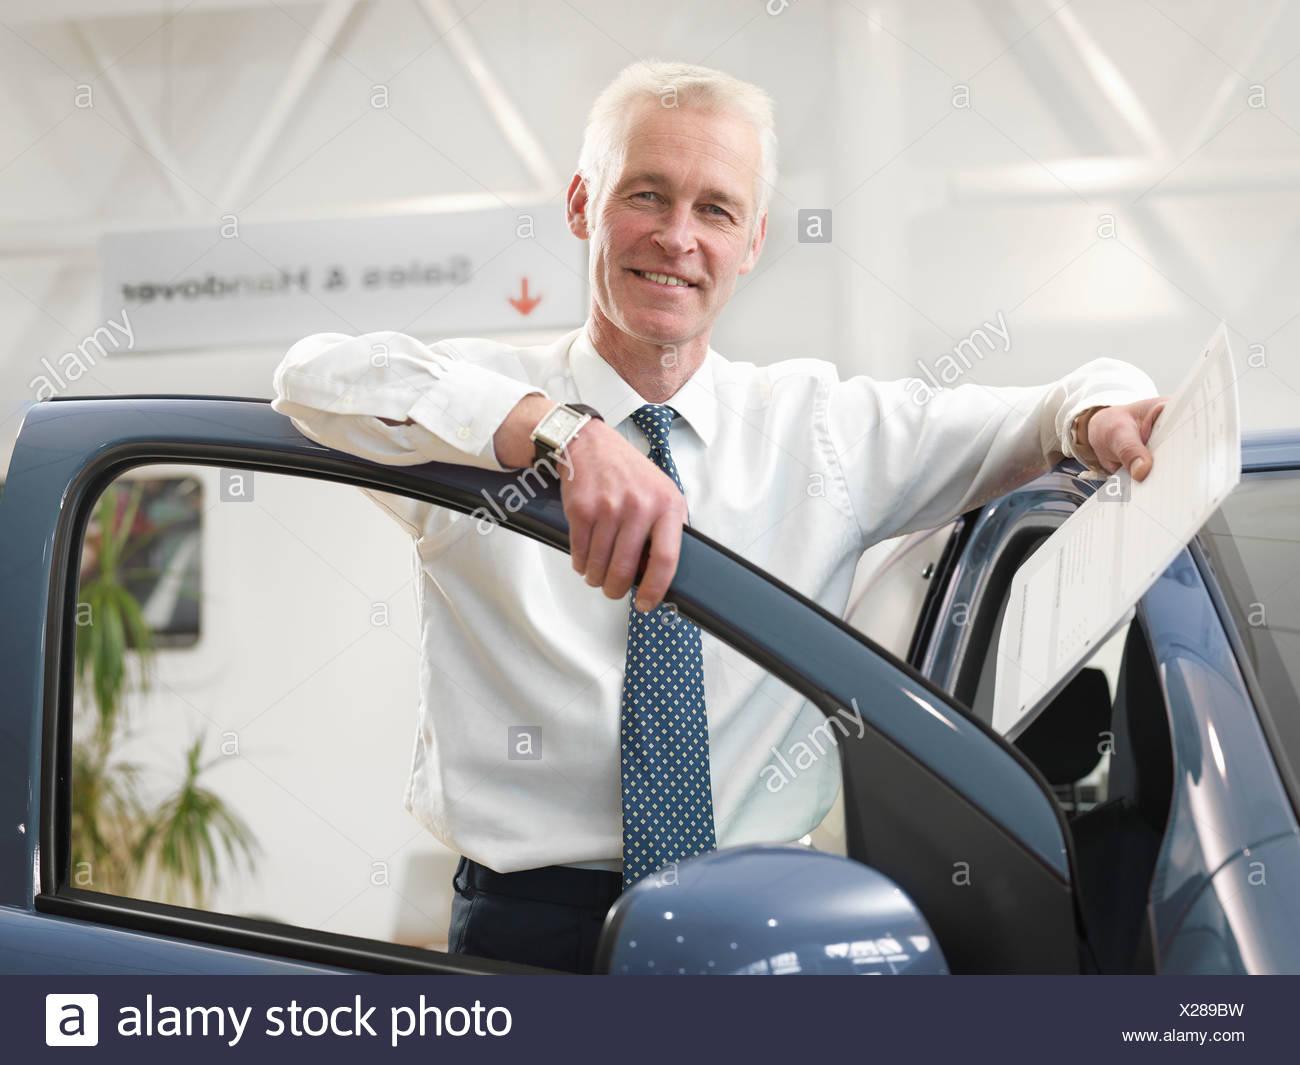 Salesman with car in car dealership - Stock Image